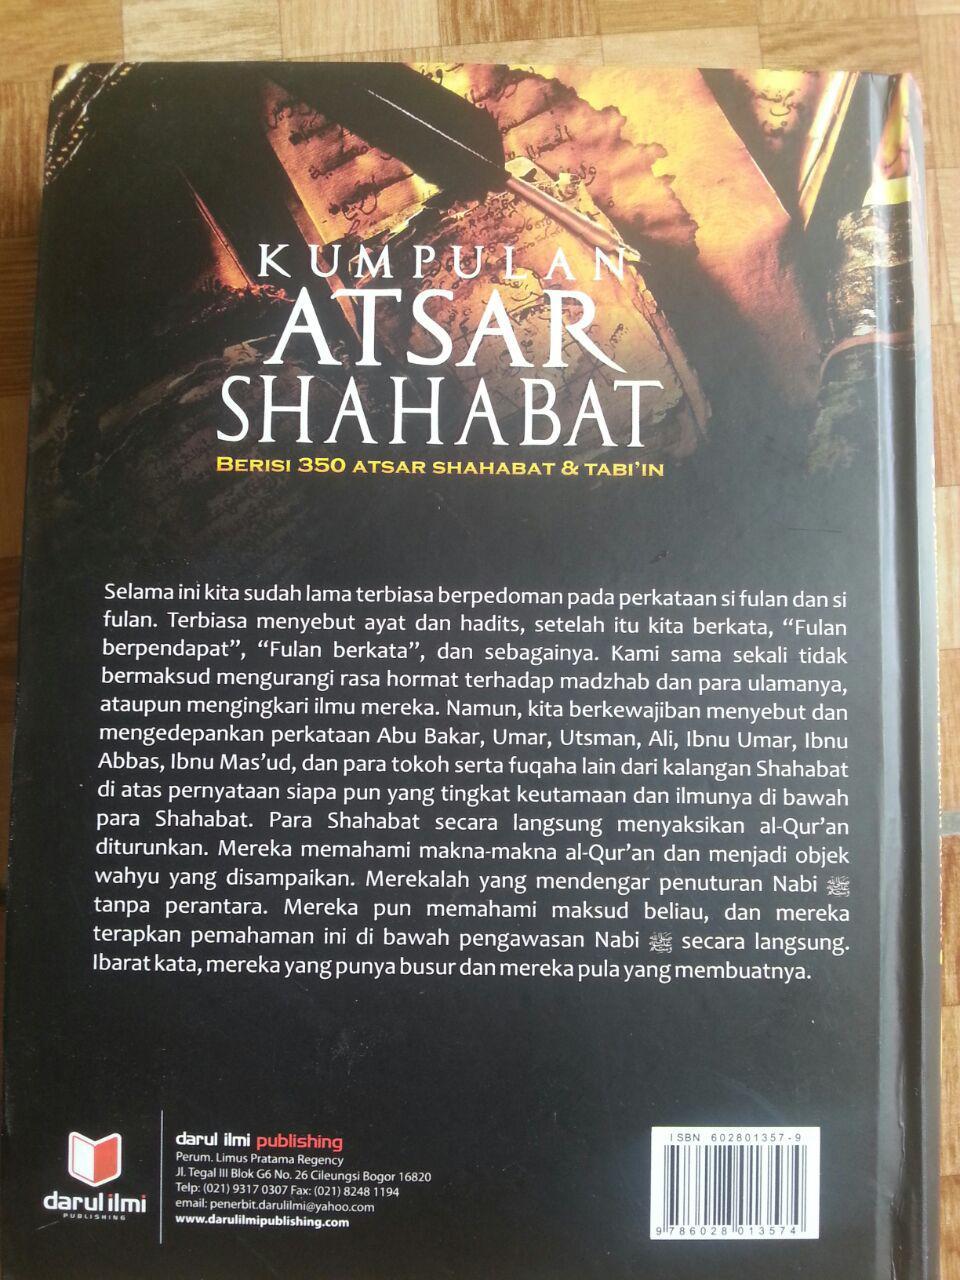 Buku Kumpulan Atsar Shahabat 1 Set 2 Jilid cover 2